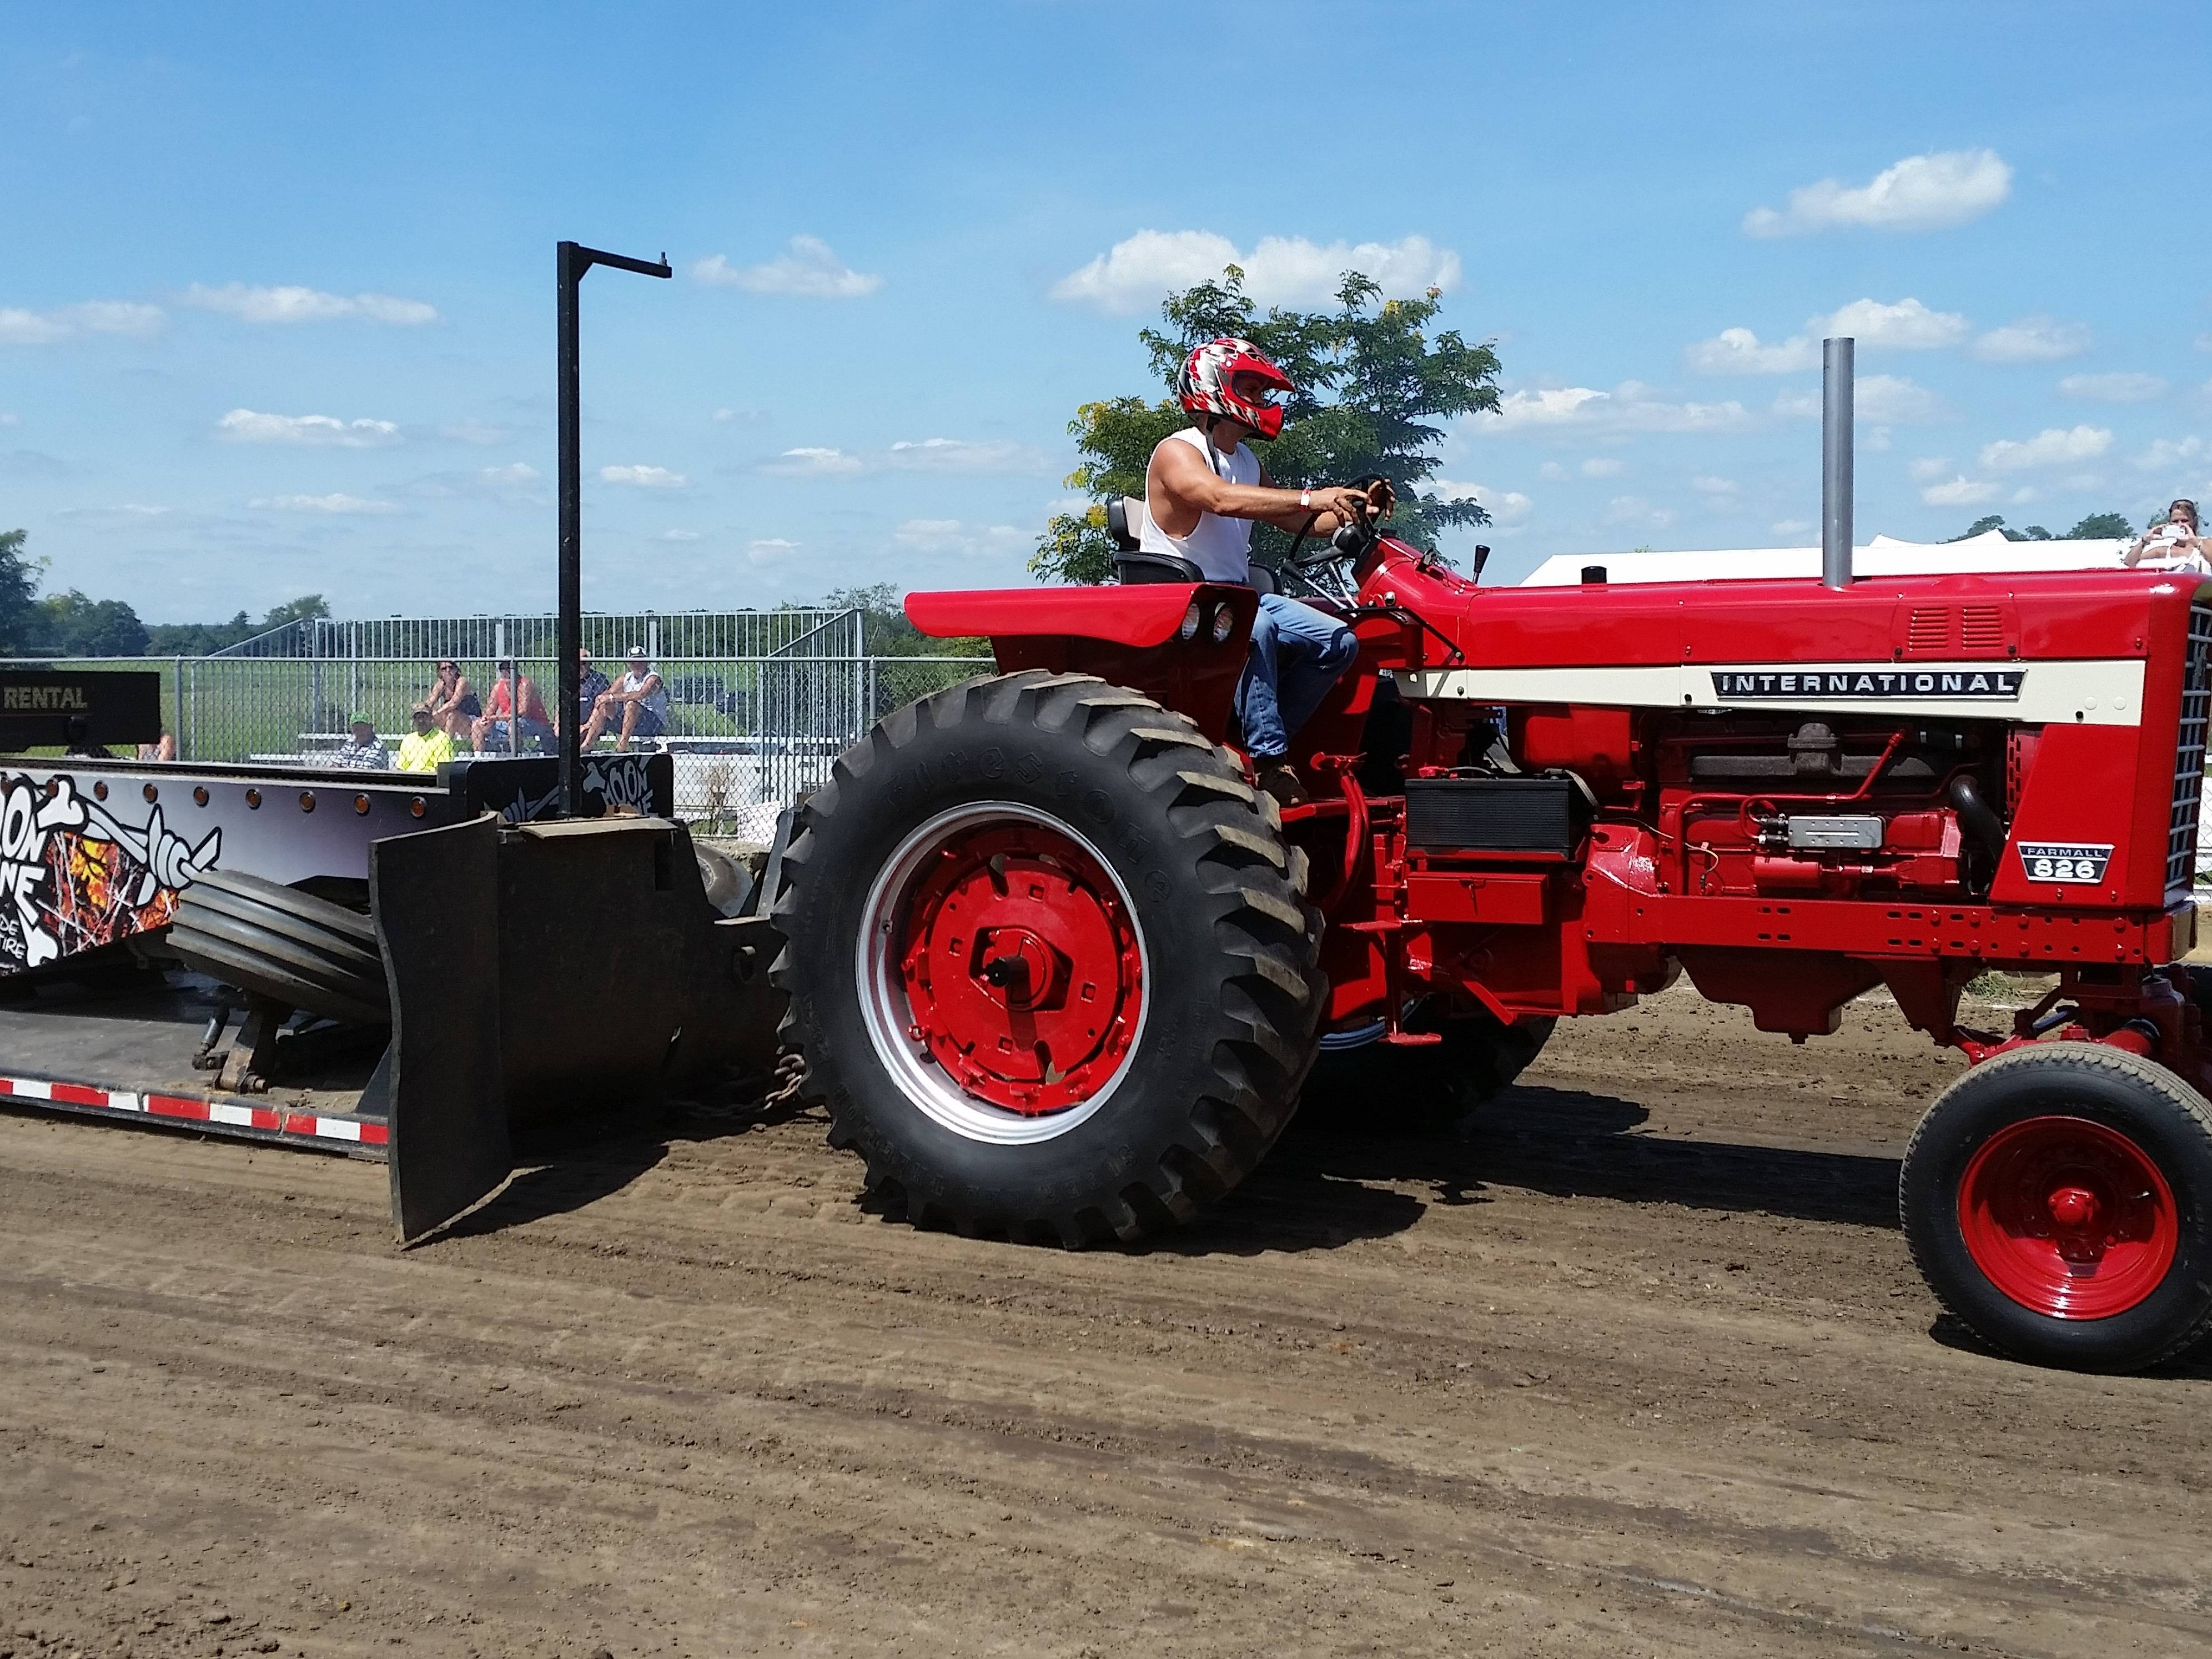 2a58bc56f800b146e2f2_tractorInt16.JPG